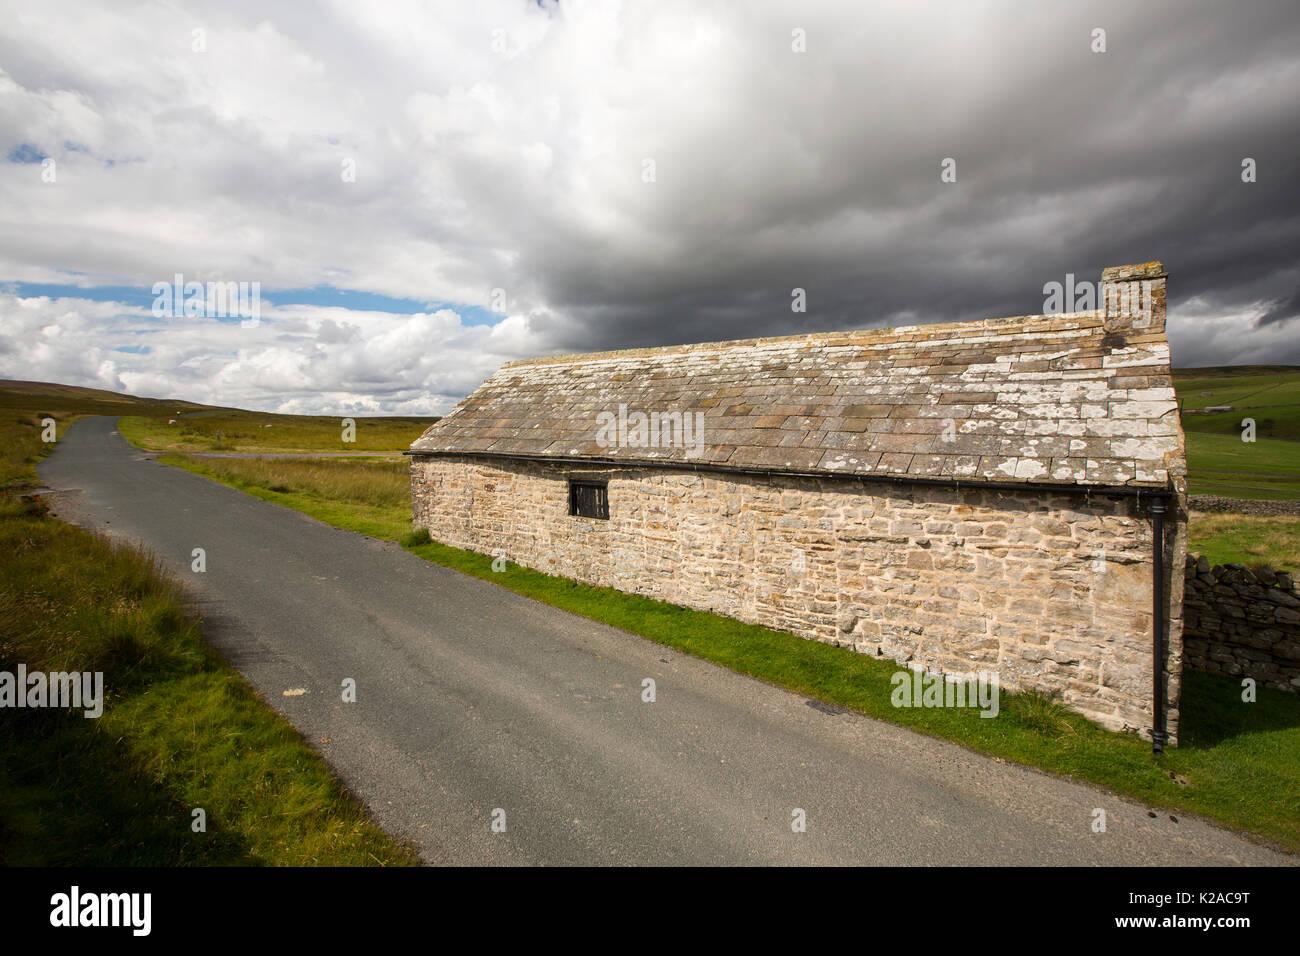 A roadside barn in Arkengarthdale in the Yorkshire Dales National Park, UK. - Stock Image